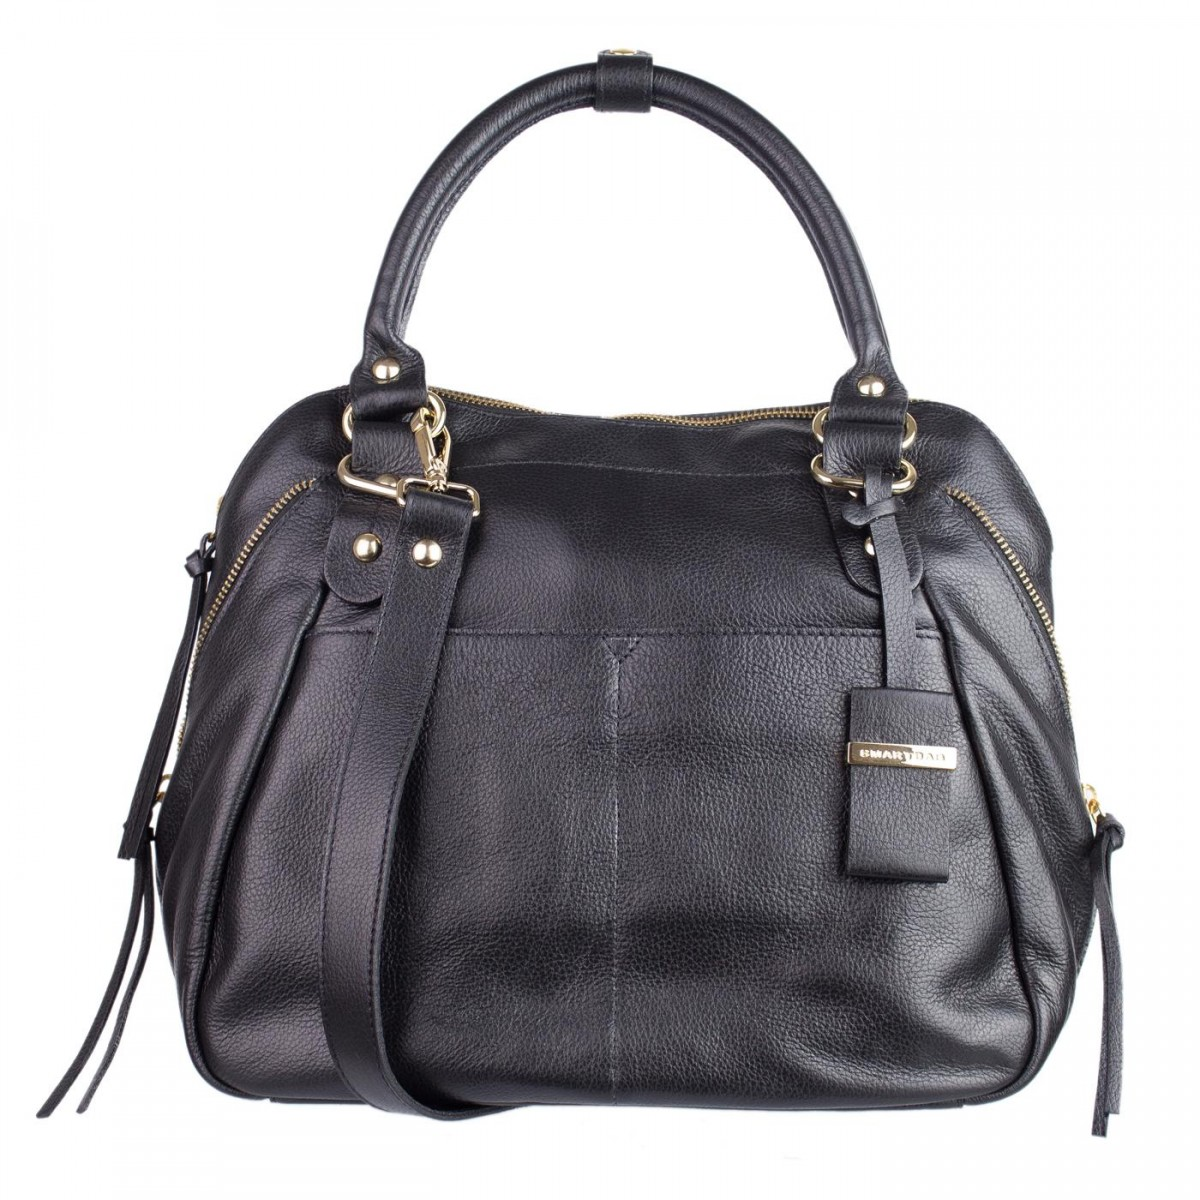 Bolsa Feminina Casual : Bizz store bolsa feminina smartbag casual couro